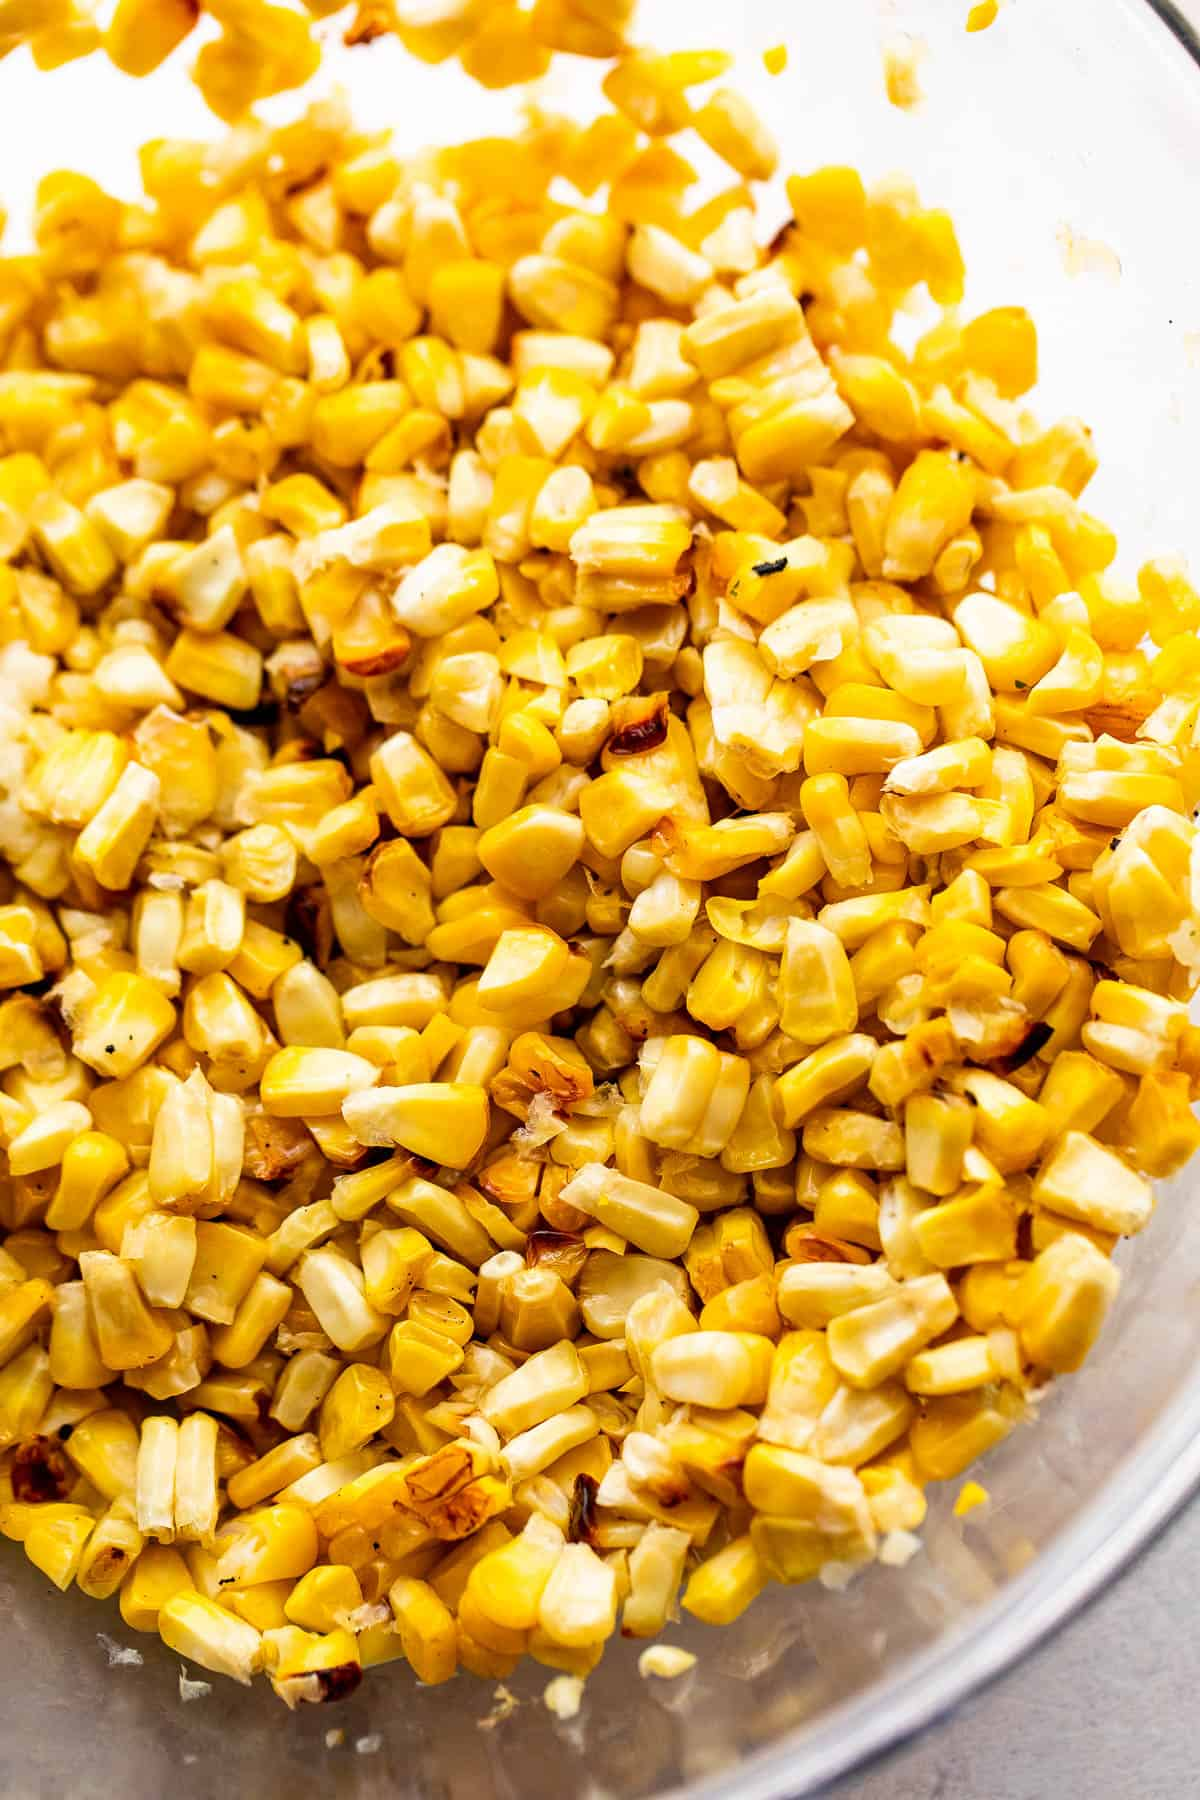 corn kernels in a glass bowl